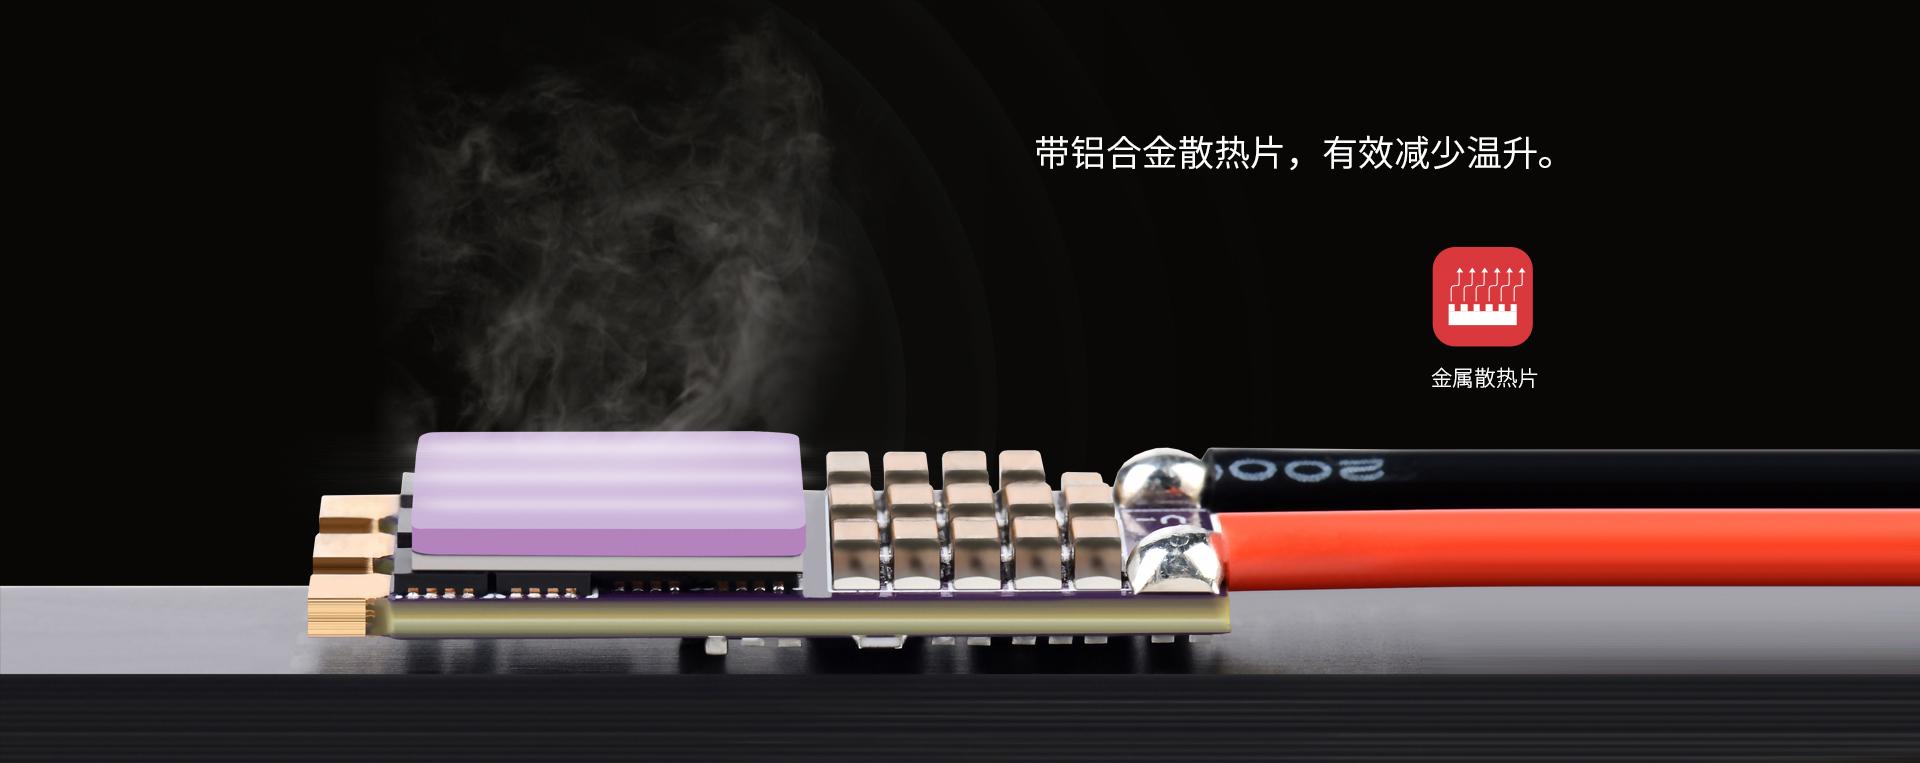 img-3-散热铝片.jpg